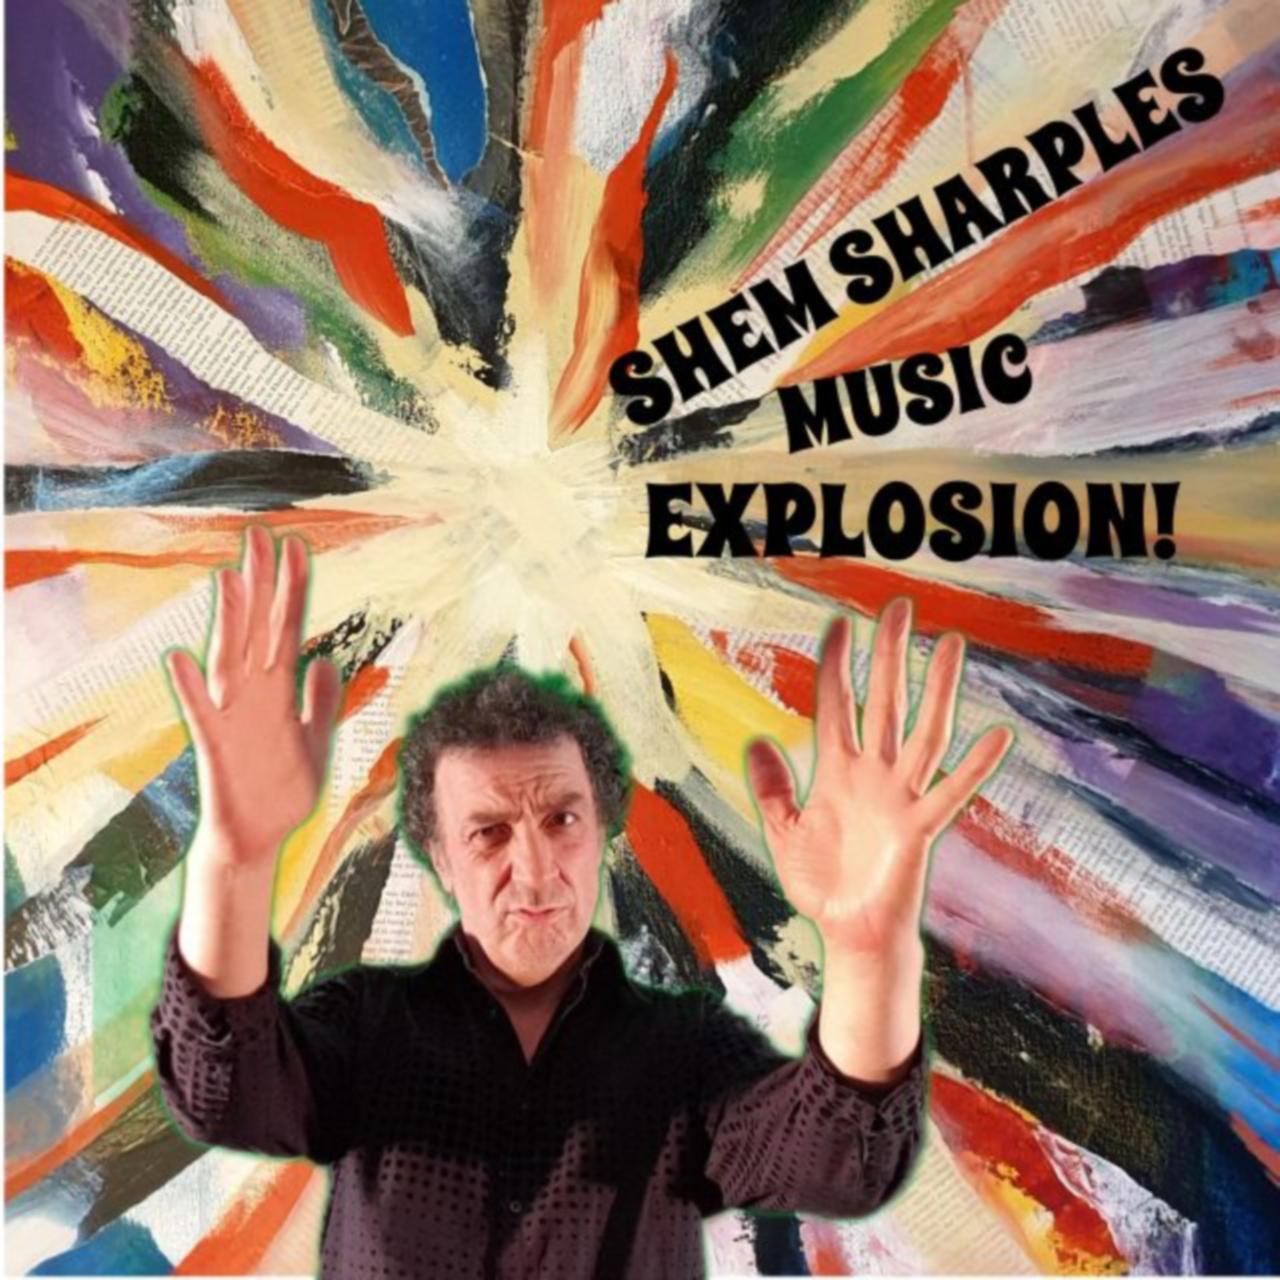 the shem sharples music explosion